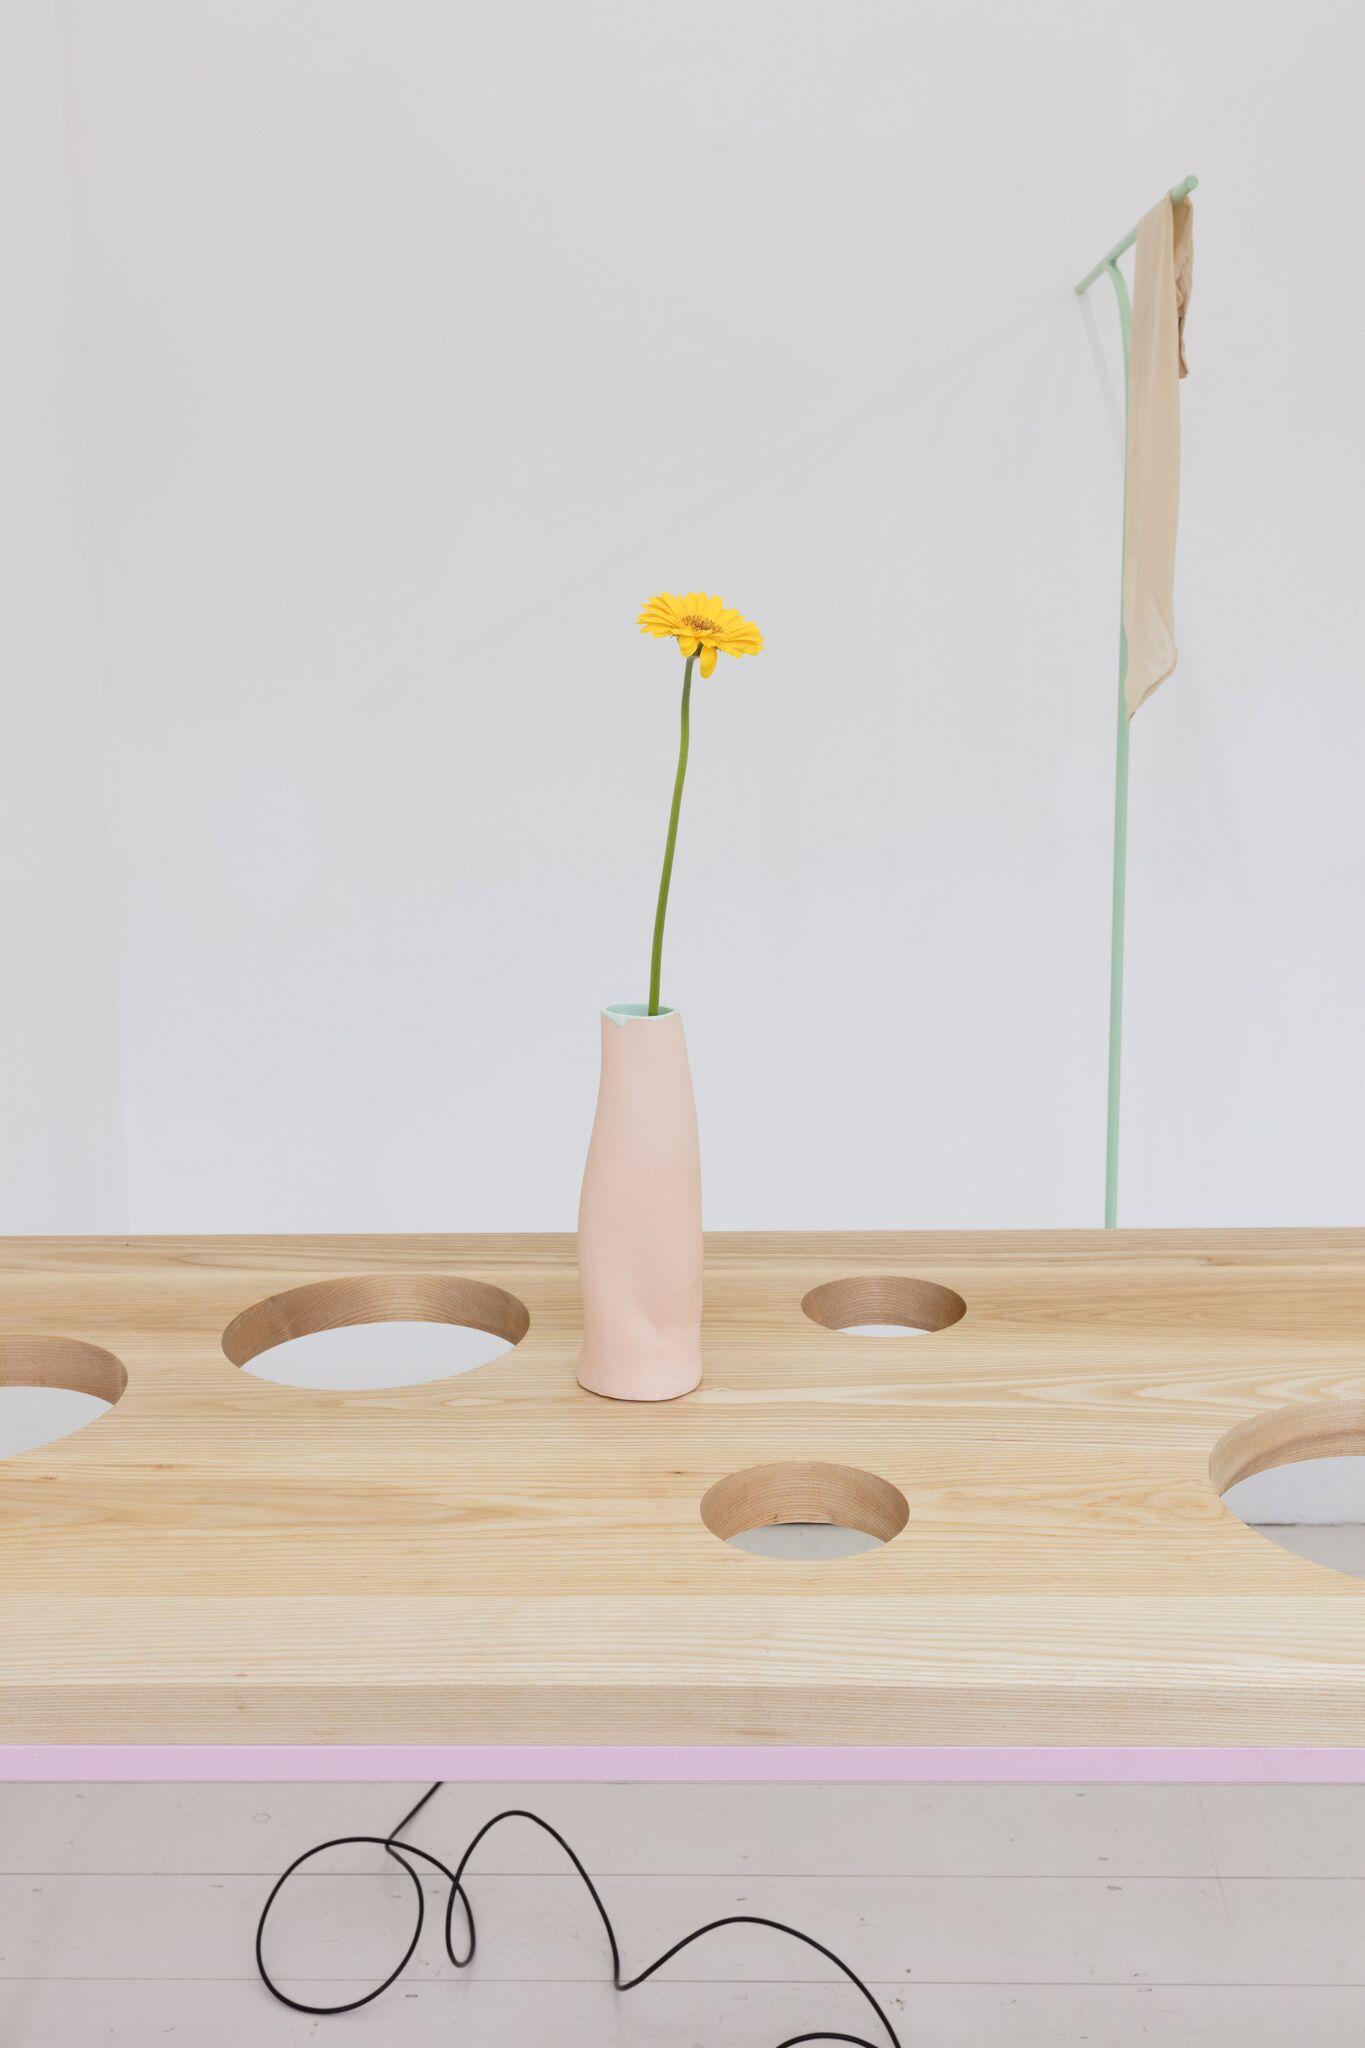 Ben Cain, Passive Imperative Participation Vibe, installation view, 2018. Documentation: Plastiques Photography (Ben Cain - Passive Imperative Participation Vibe 16)